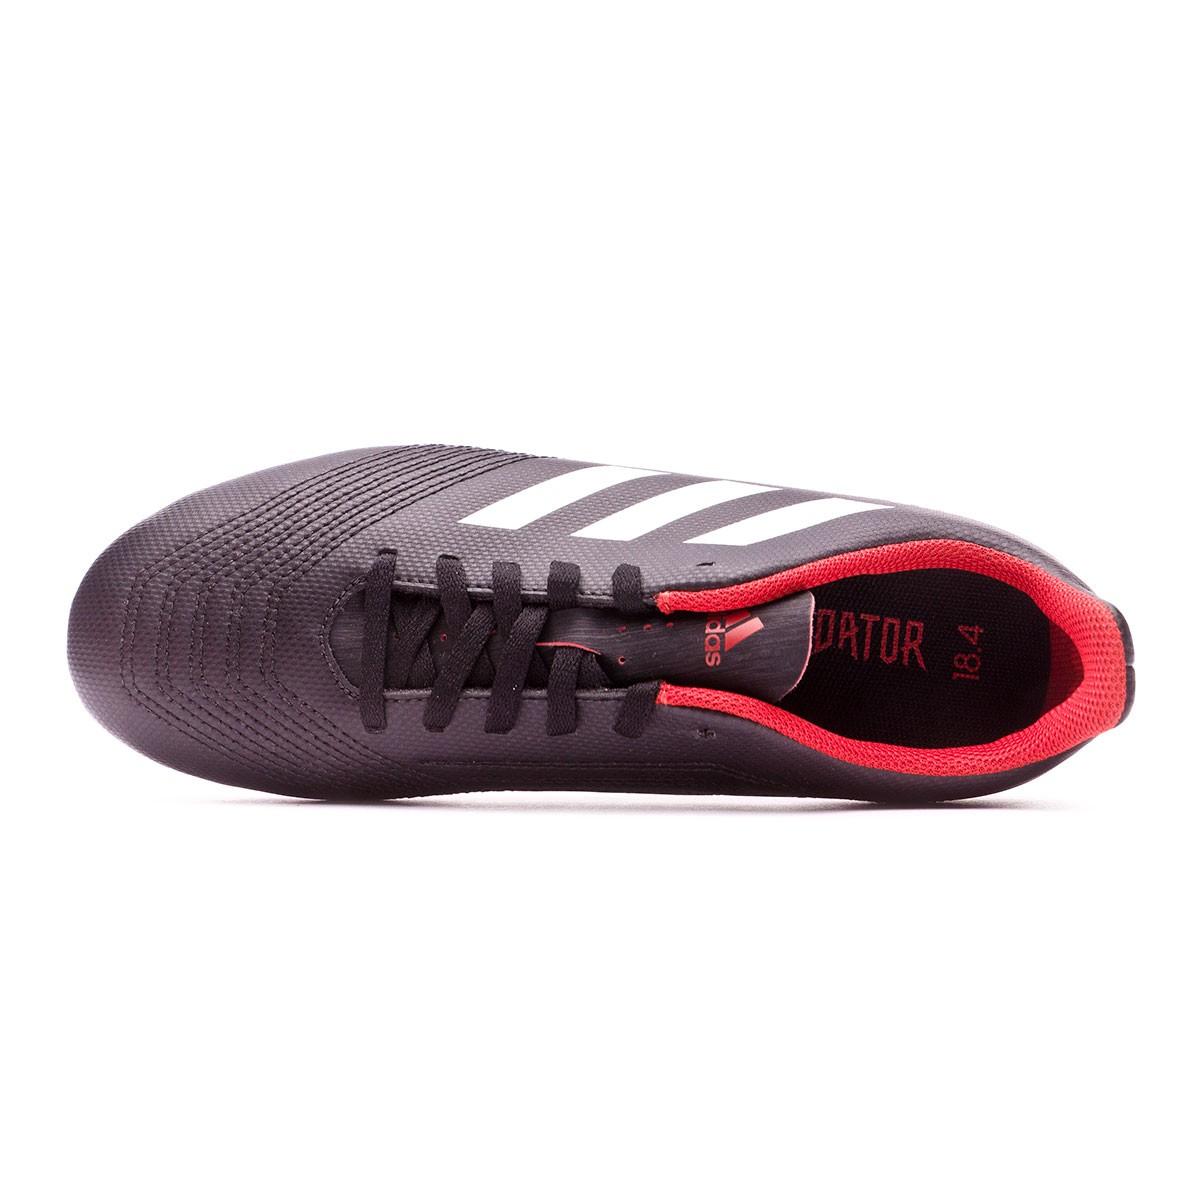 5fbbad8597be0 Football Boots adidas Kids Predator 18.4 FxG Core black-White-Red - Football  store Fútbol Emotion